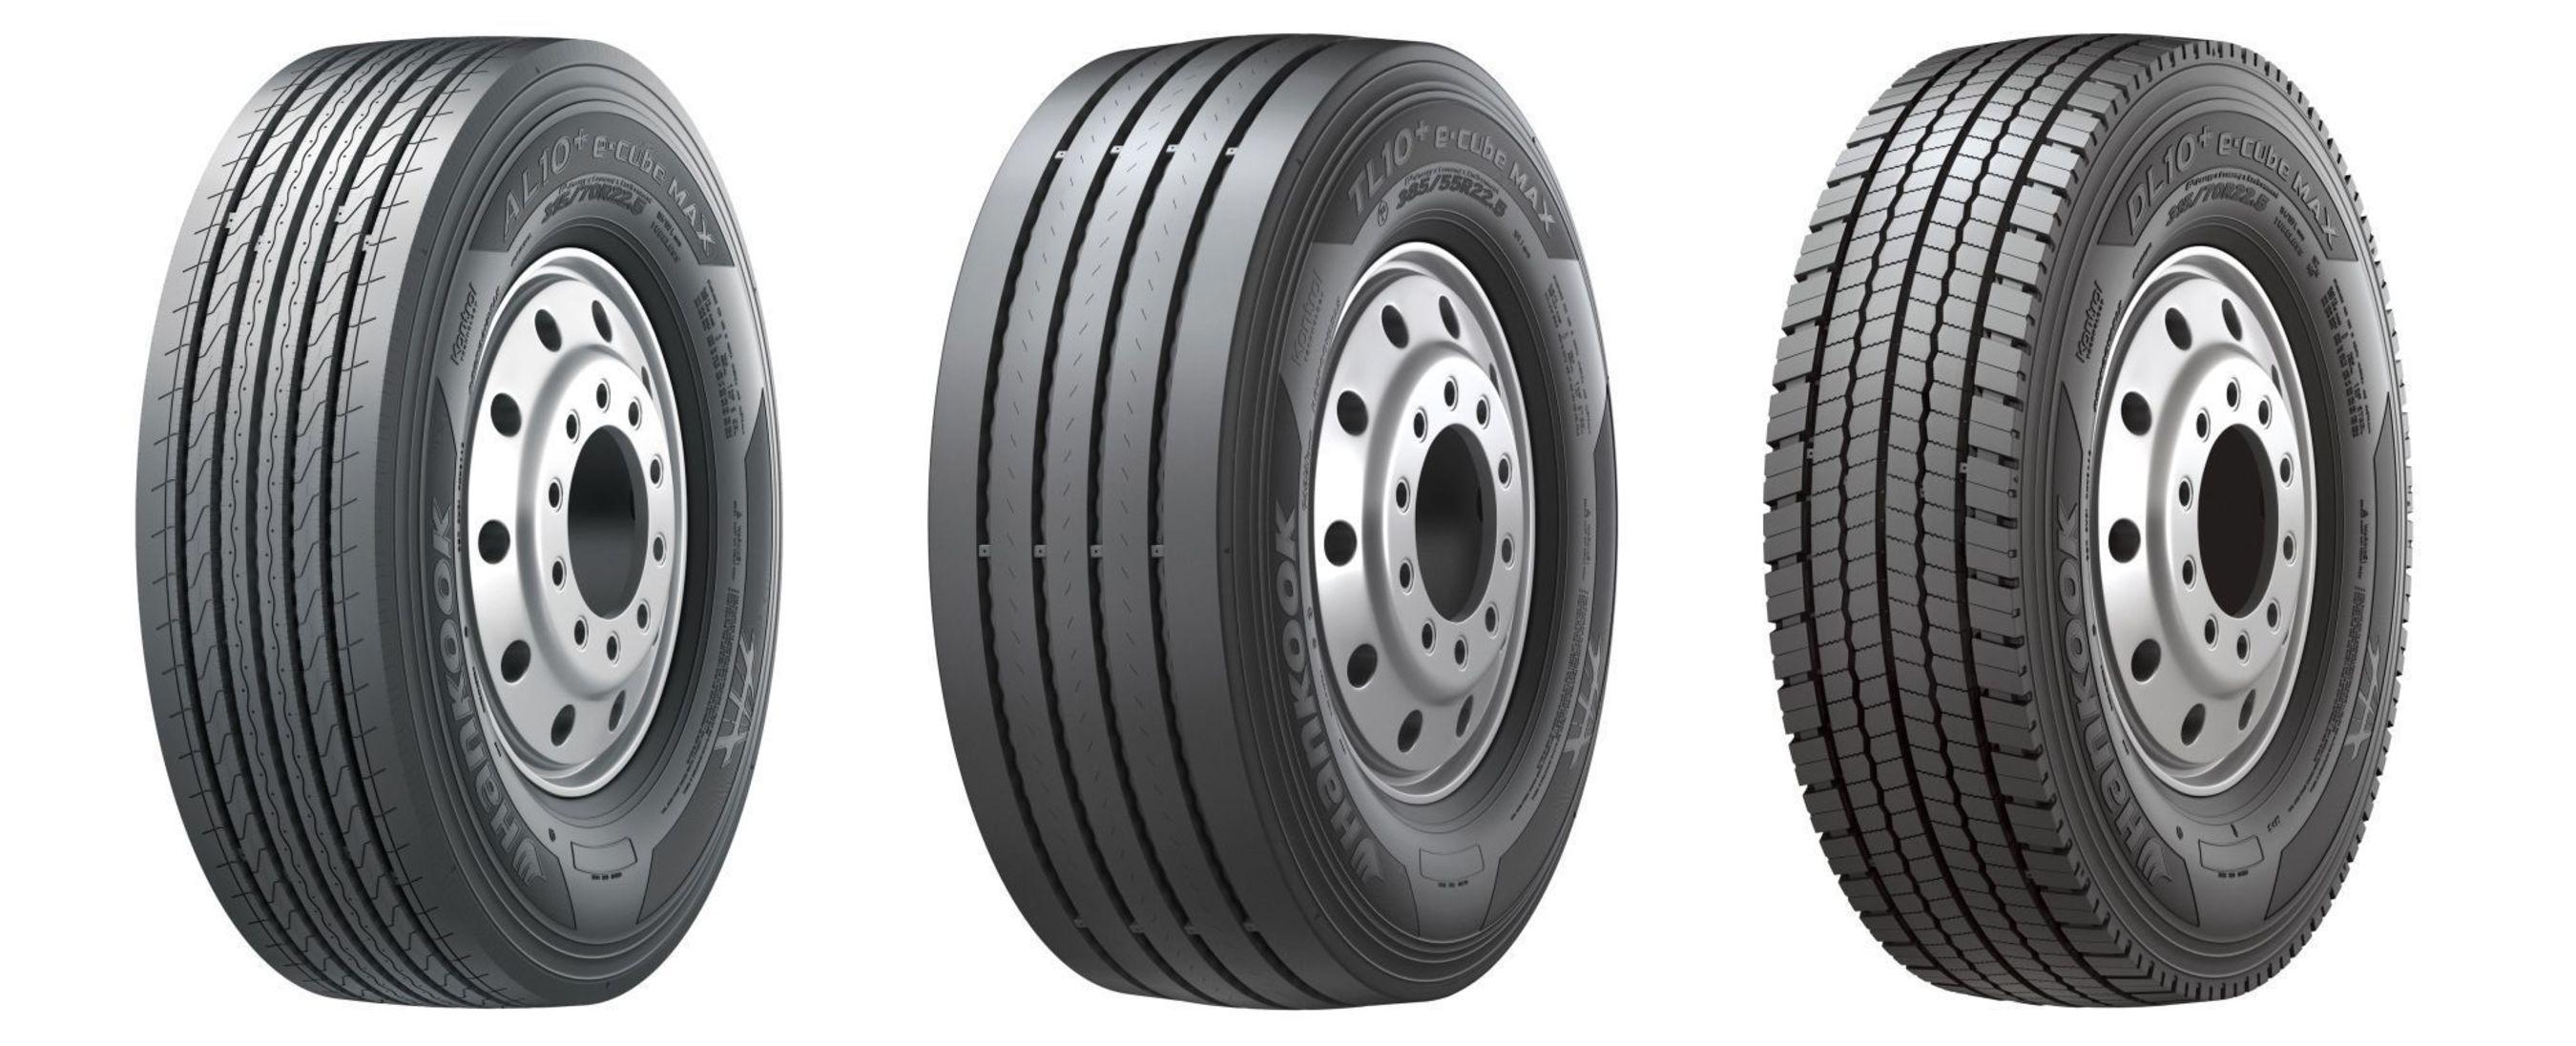 Tyre manufacturer Hankook will be supplying Original Equipment for various MAN heavy-duty trucks in future. +++ Hankook, MAN Trucks, Original Equipment, OE, Premium tyre manufacturer, Hankook tyres, Hankook e-cube MAX, MAN +++ (PRNewsFoto/Hankook Tire Europe GmbH)